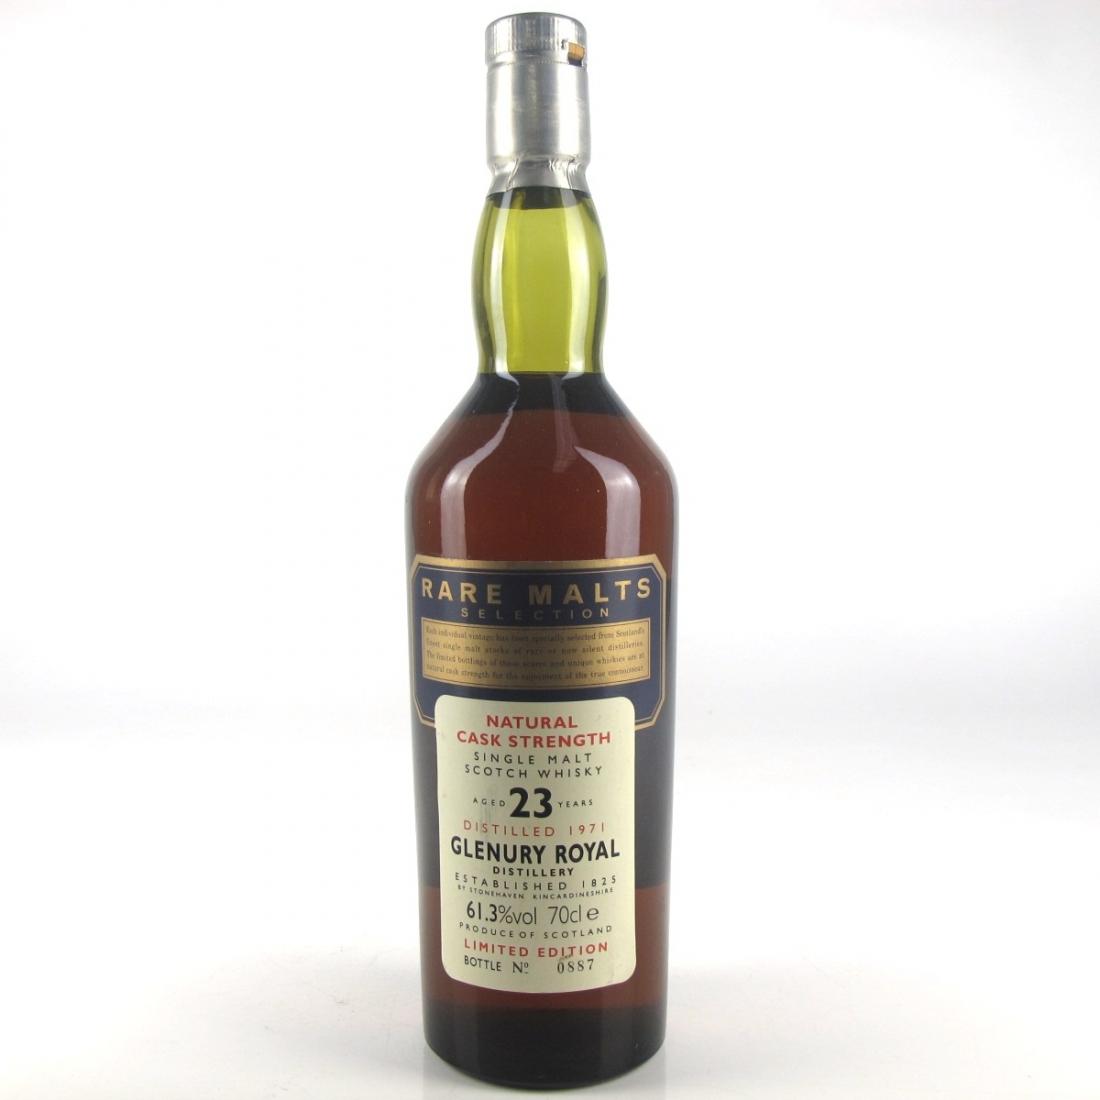 Glenury Royal 1971 Rare Malt 23 Year Old / 61.3%